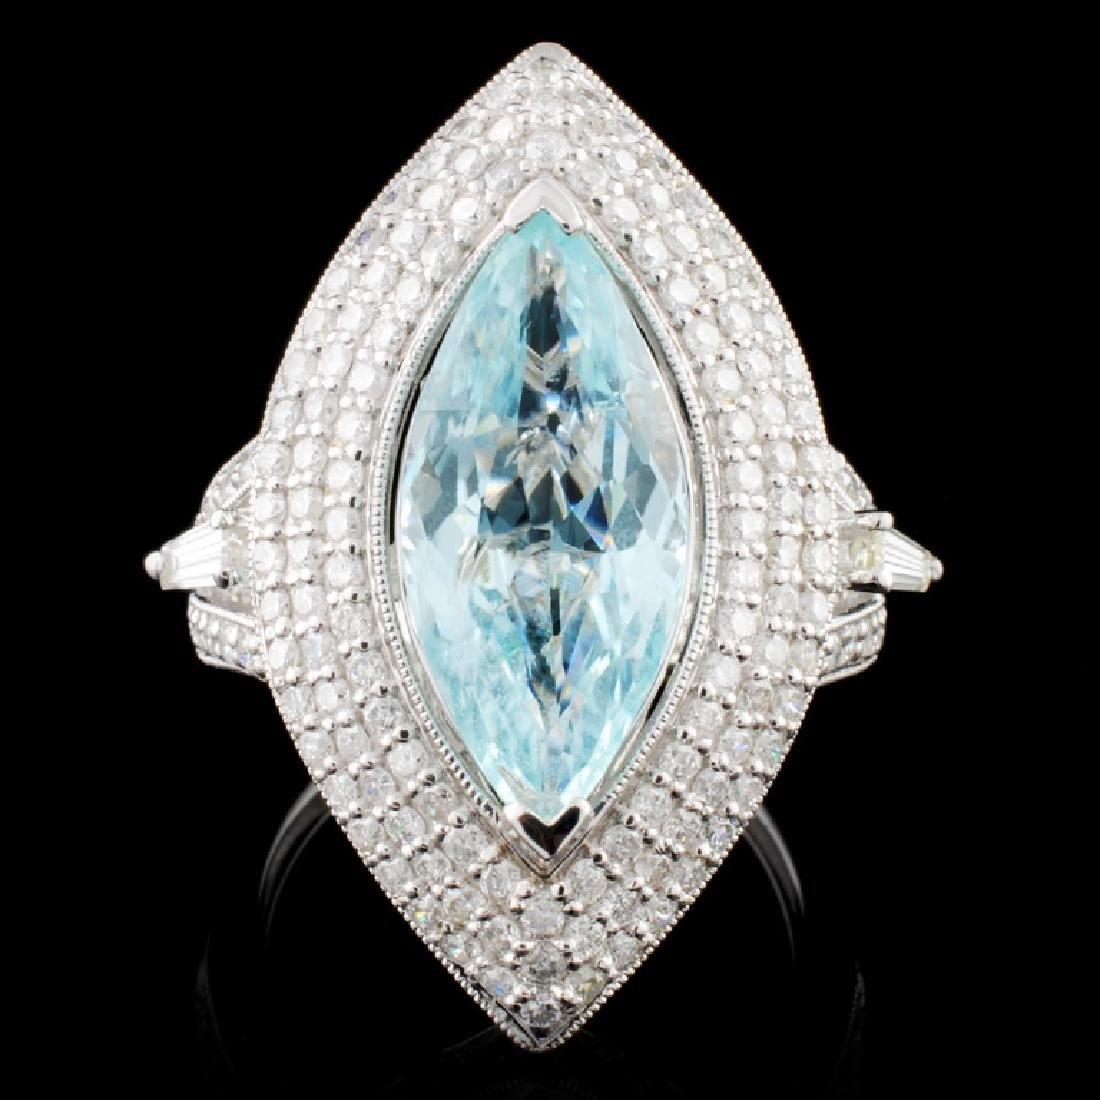 18K White Gold 3.98ct Tourmaline & 1.60ct Diamond